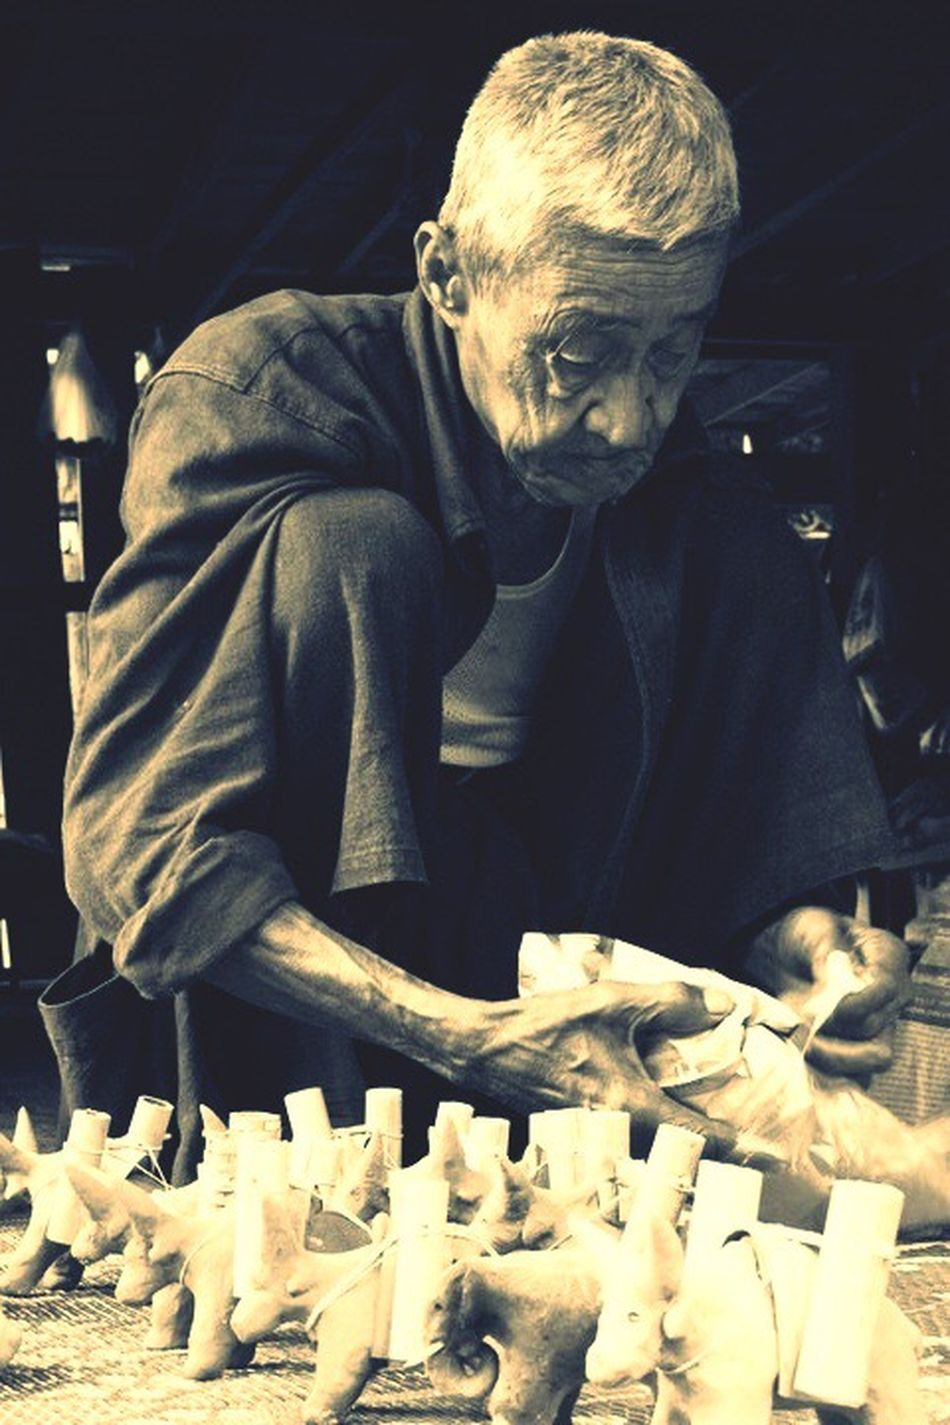 Old Man Man Elderly Senior Craft Handicraft Dolls Clay Work Artisan Local Artist Wisdom Toys Buffalo Rural Thailand Chiangmai Mae Jam Aging The Portraitist - 2016 EyeEm Awards Artist Portrait People Snap A Stranger